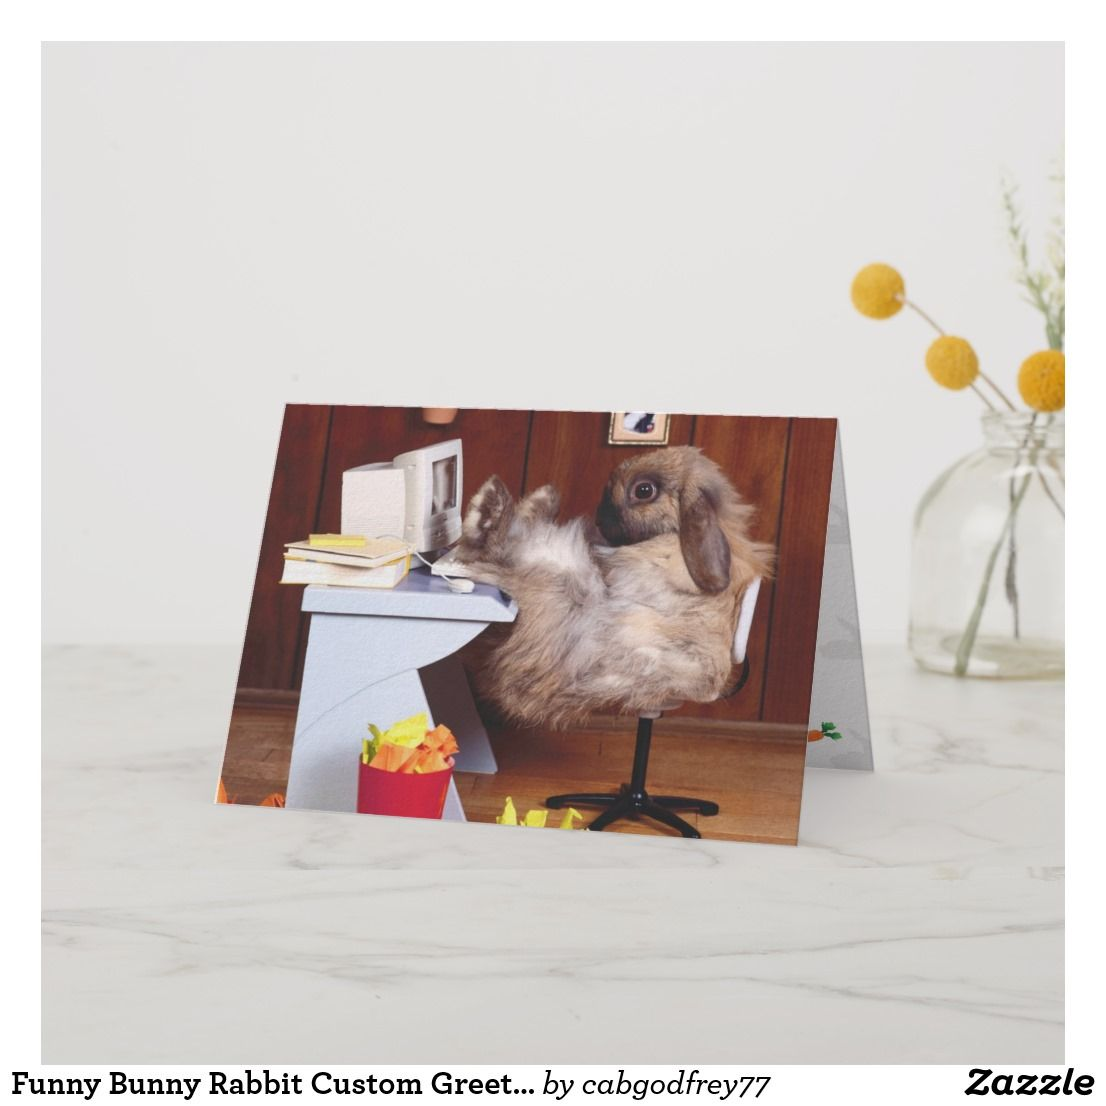 Funny Bunny Rabbit Custom Greeting Card Birthday Cardsfunny Cardsgreeting Cardshappy Cardbirthday Cardsonline Cards